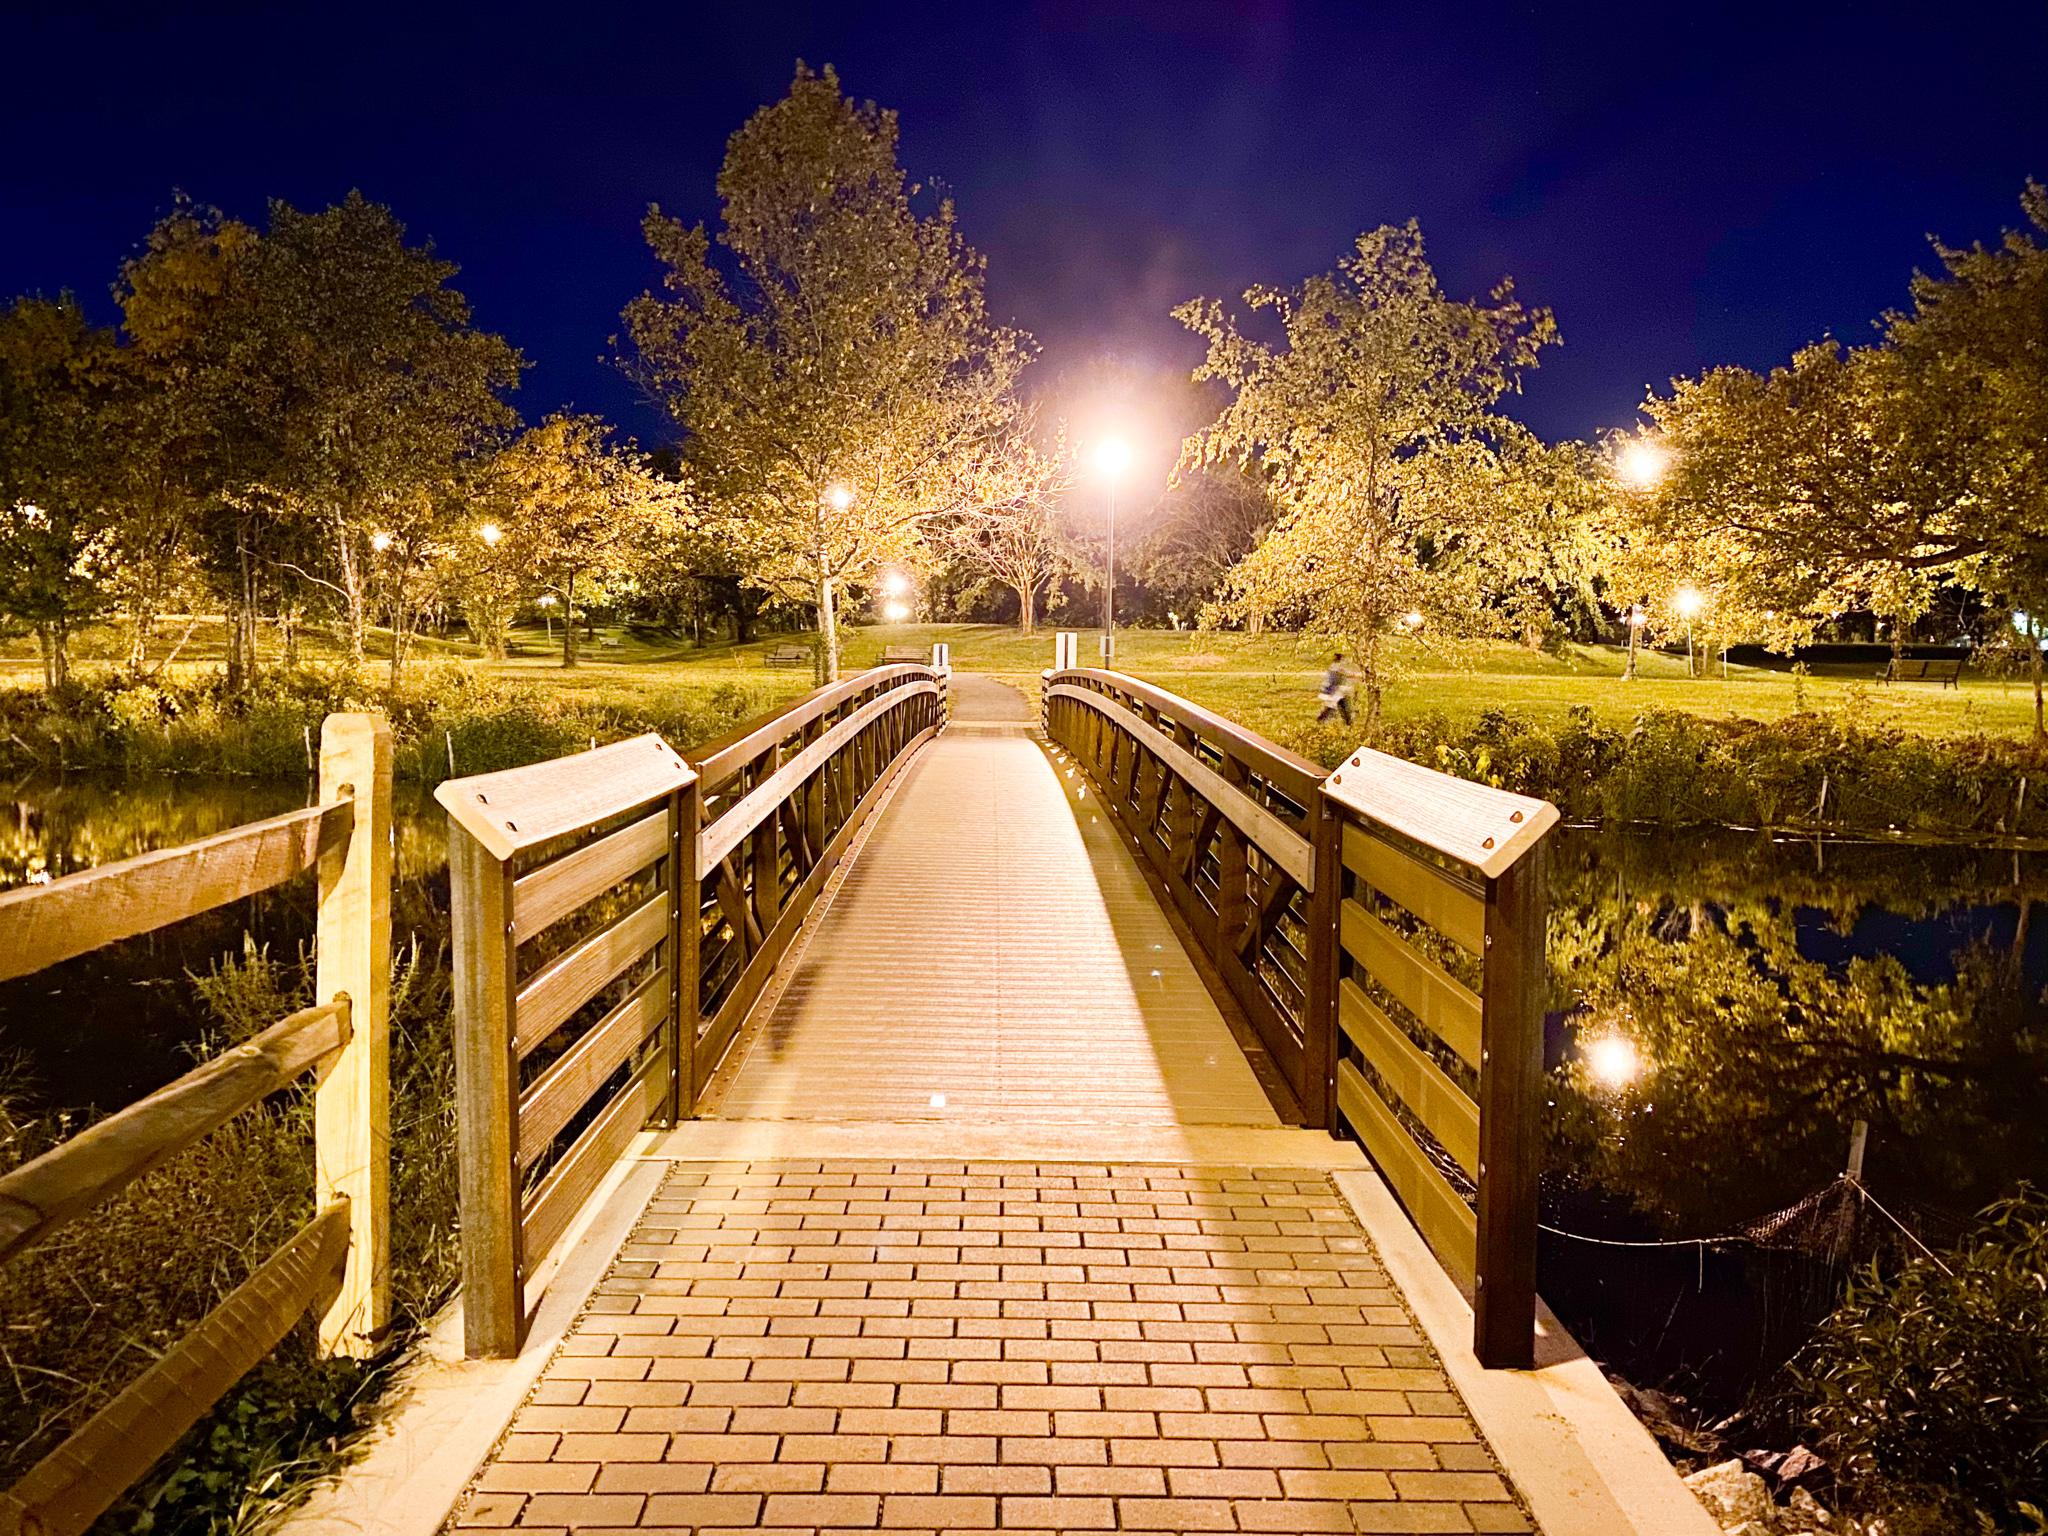 Brenman Park